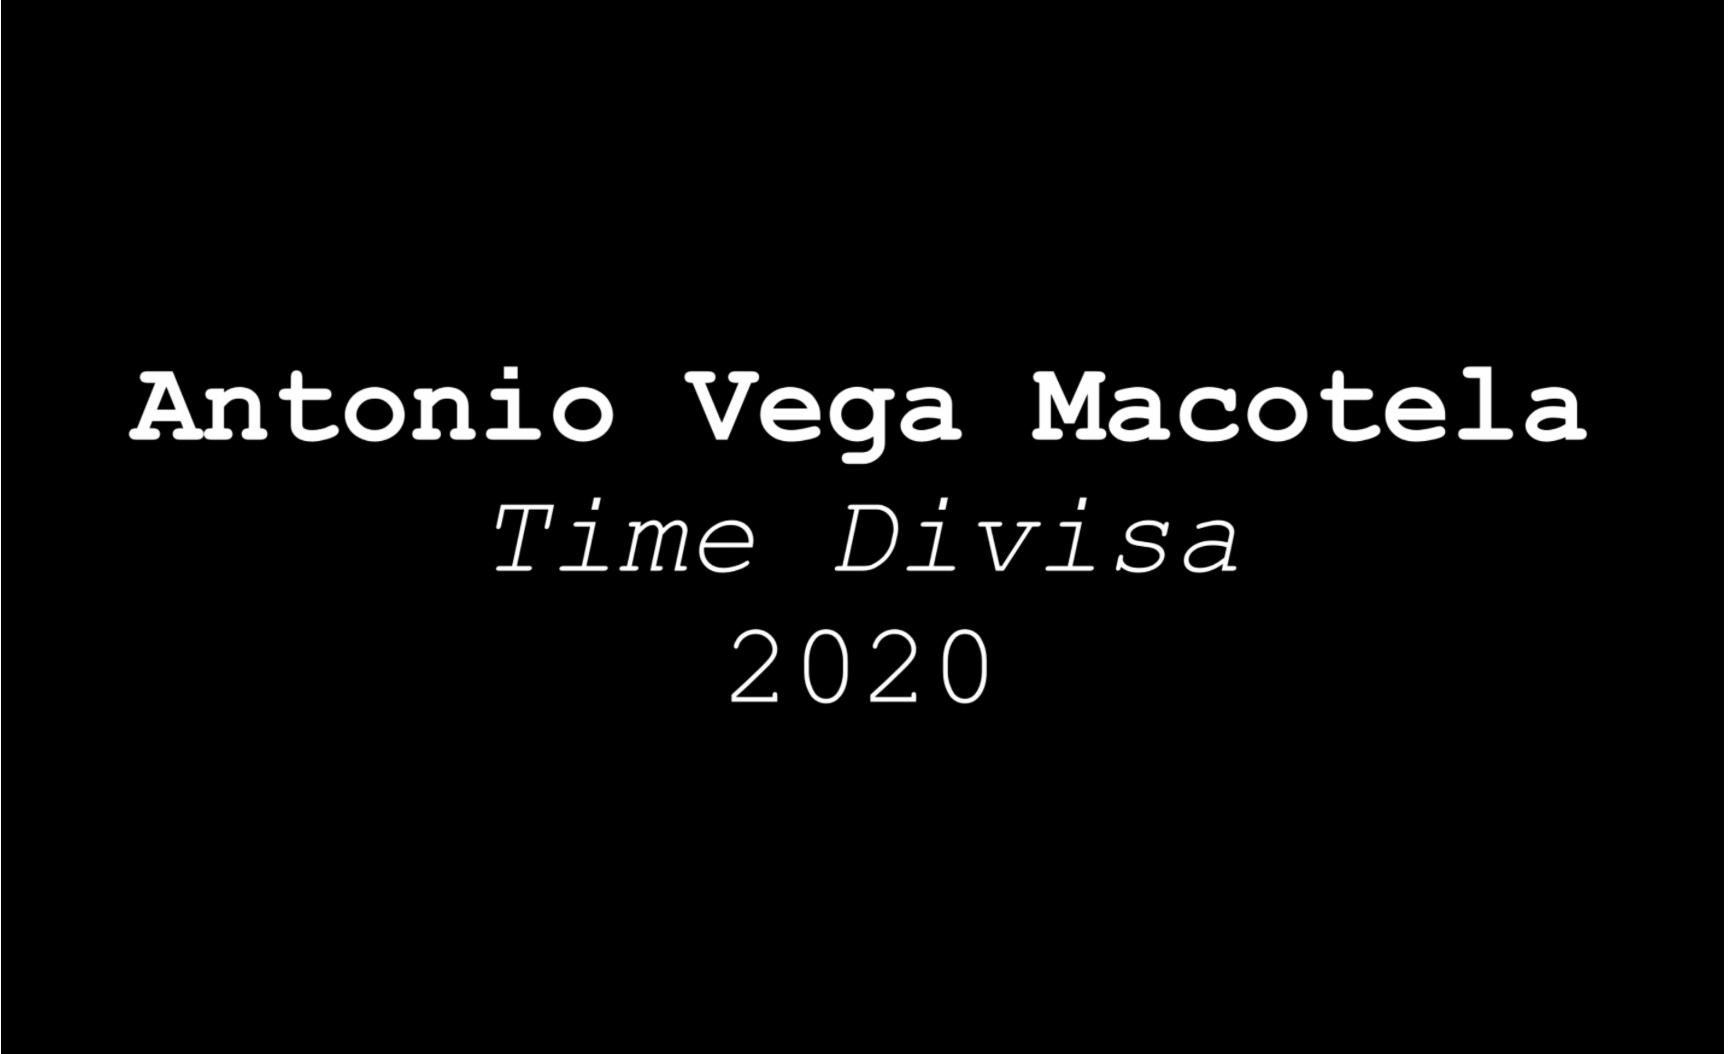 Antonio Vega Macotela | Time Divisa